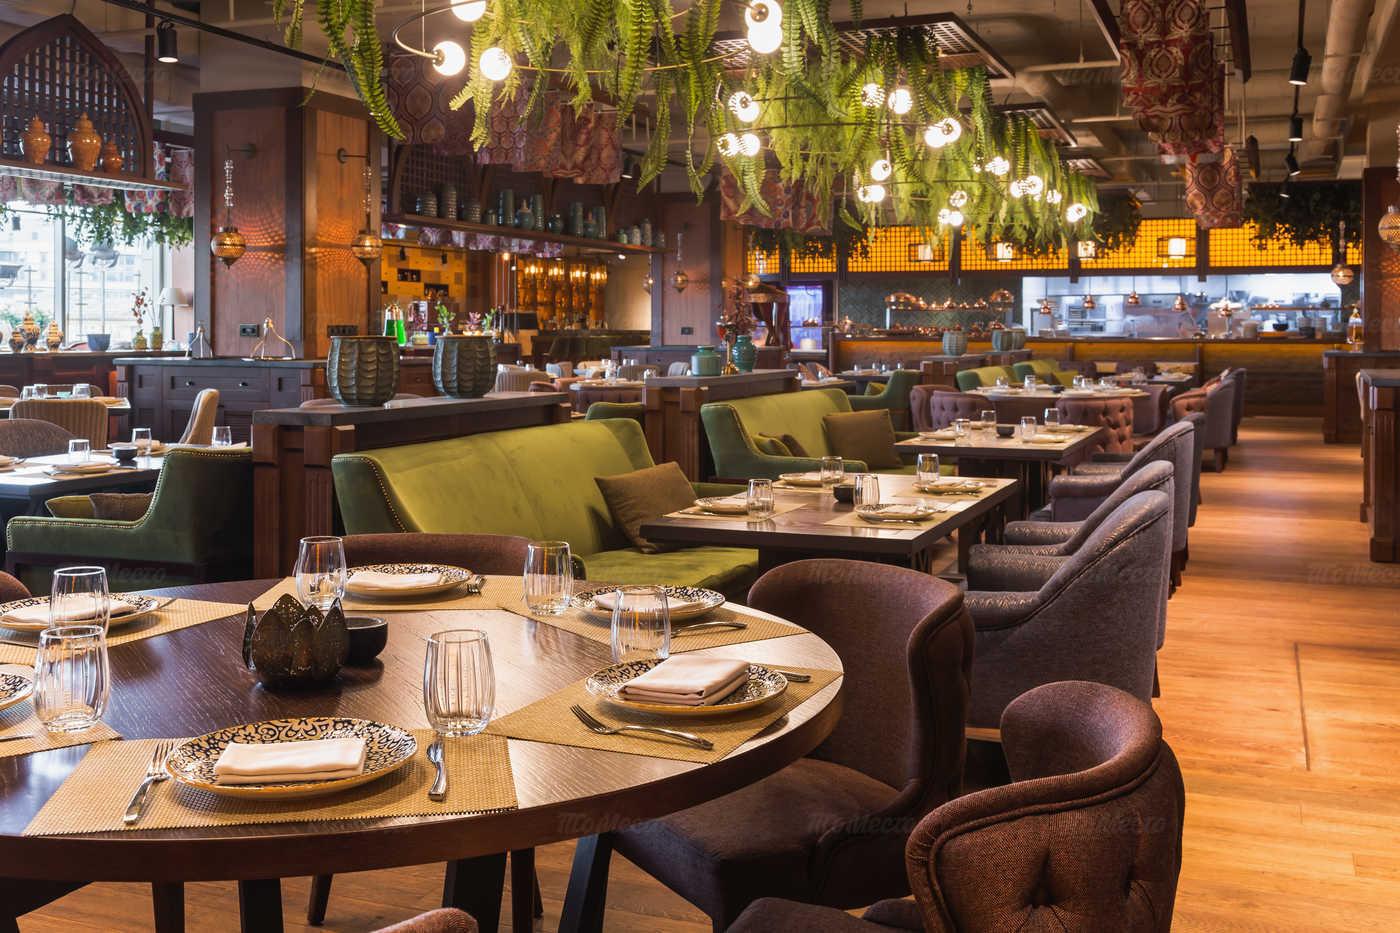 Ресторан Левантин (Levantine) на Новинском бульваре фото 6